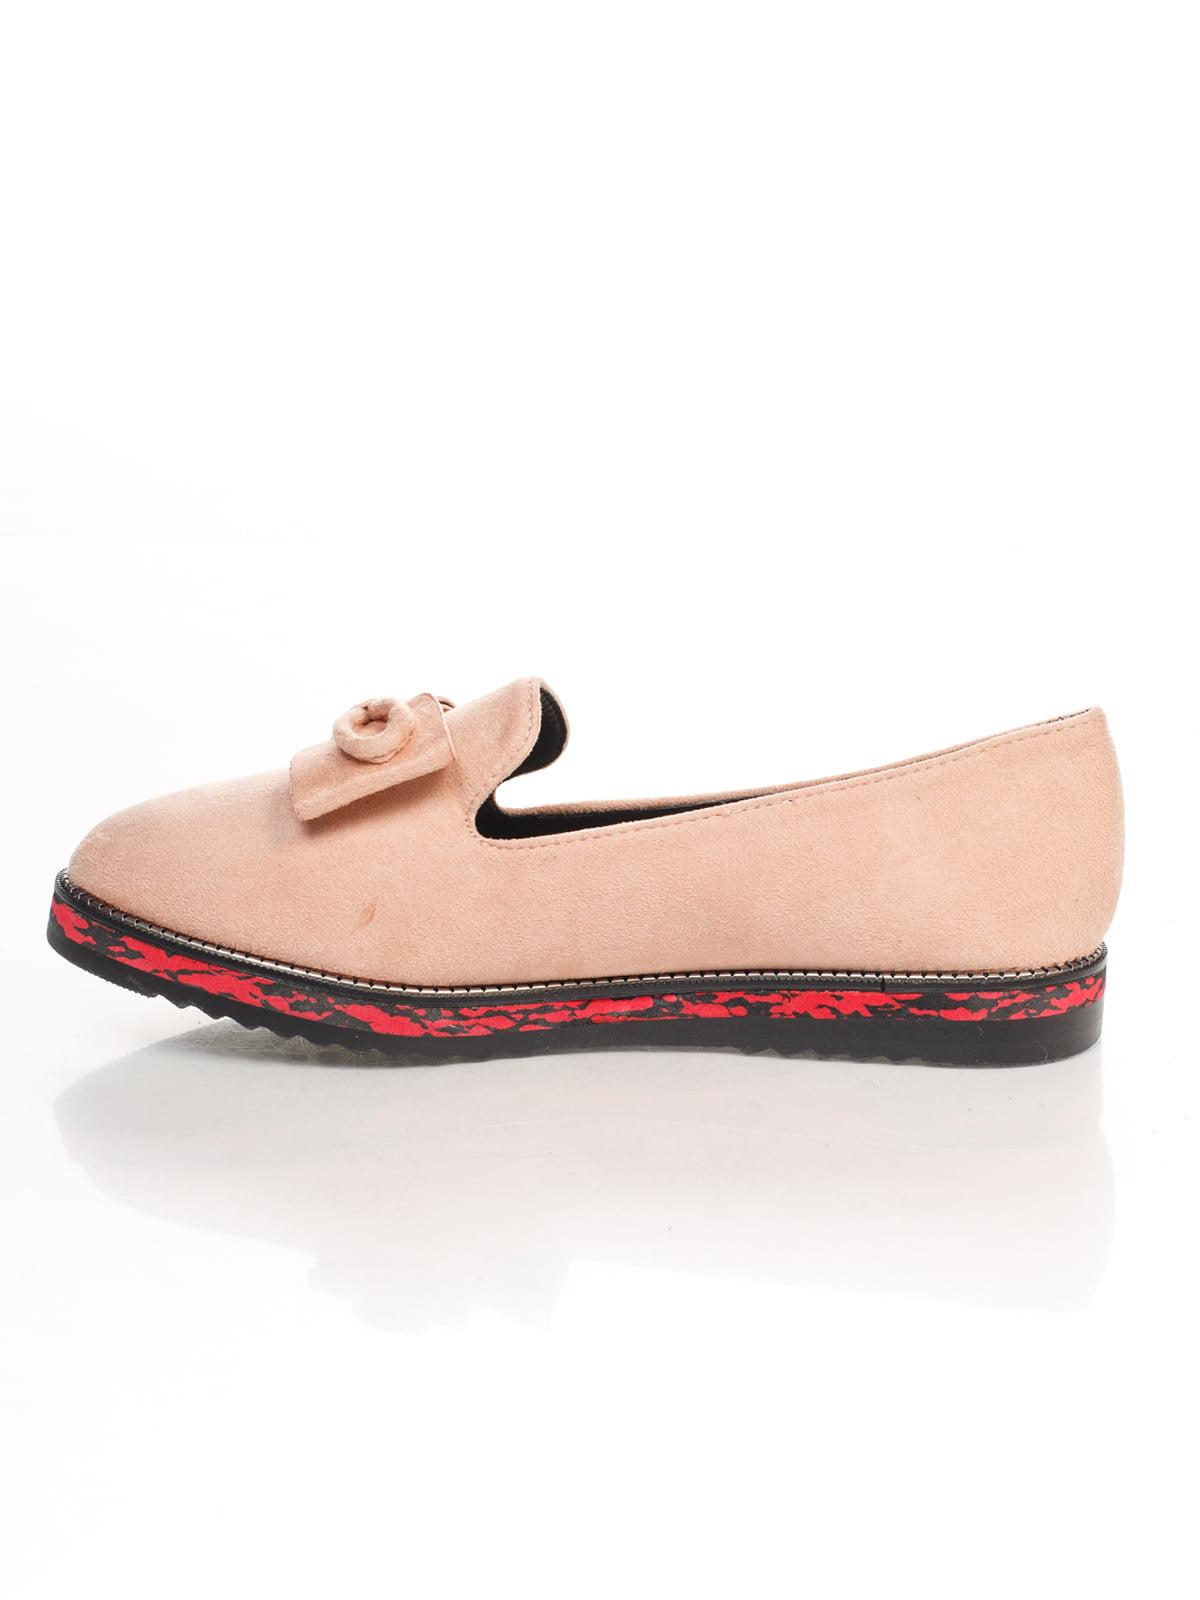 Туфли бежевые | 4605888 | фото 2